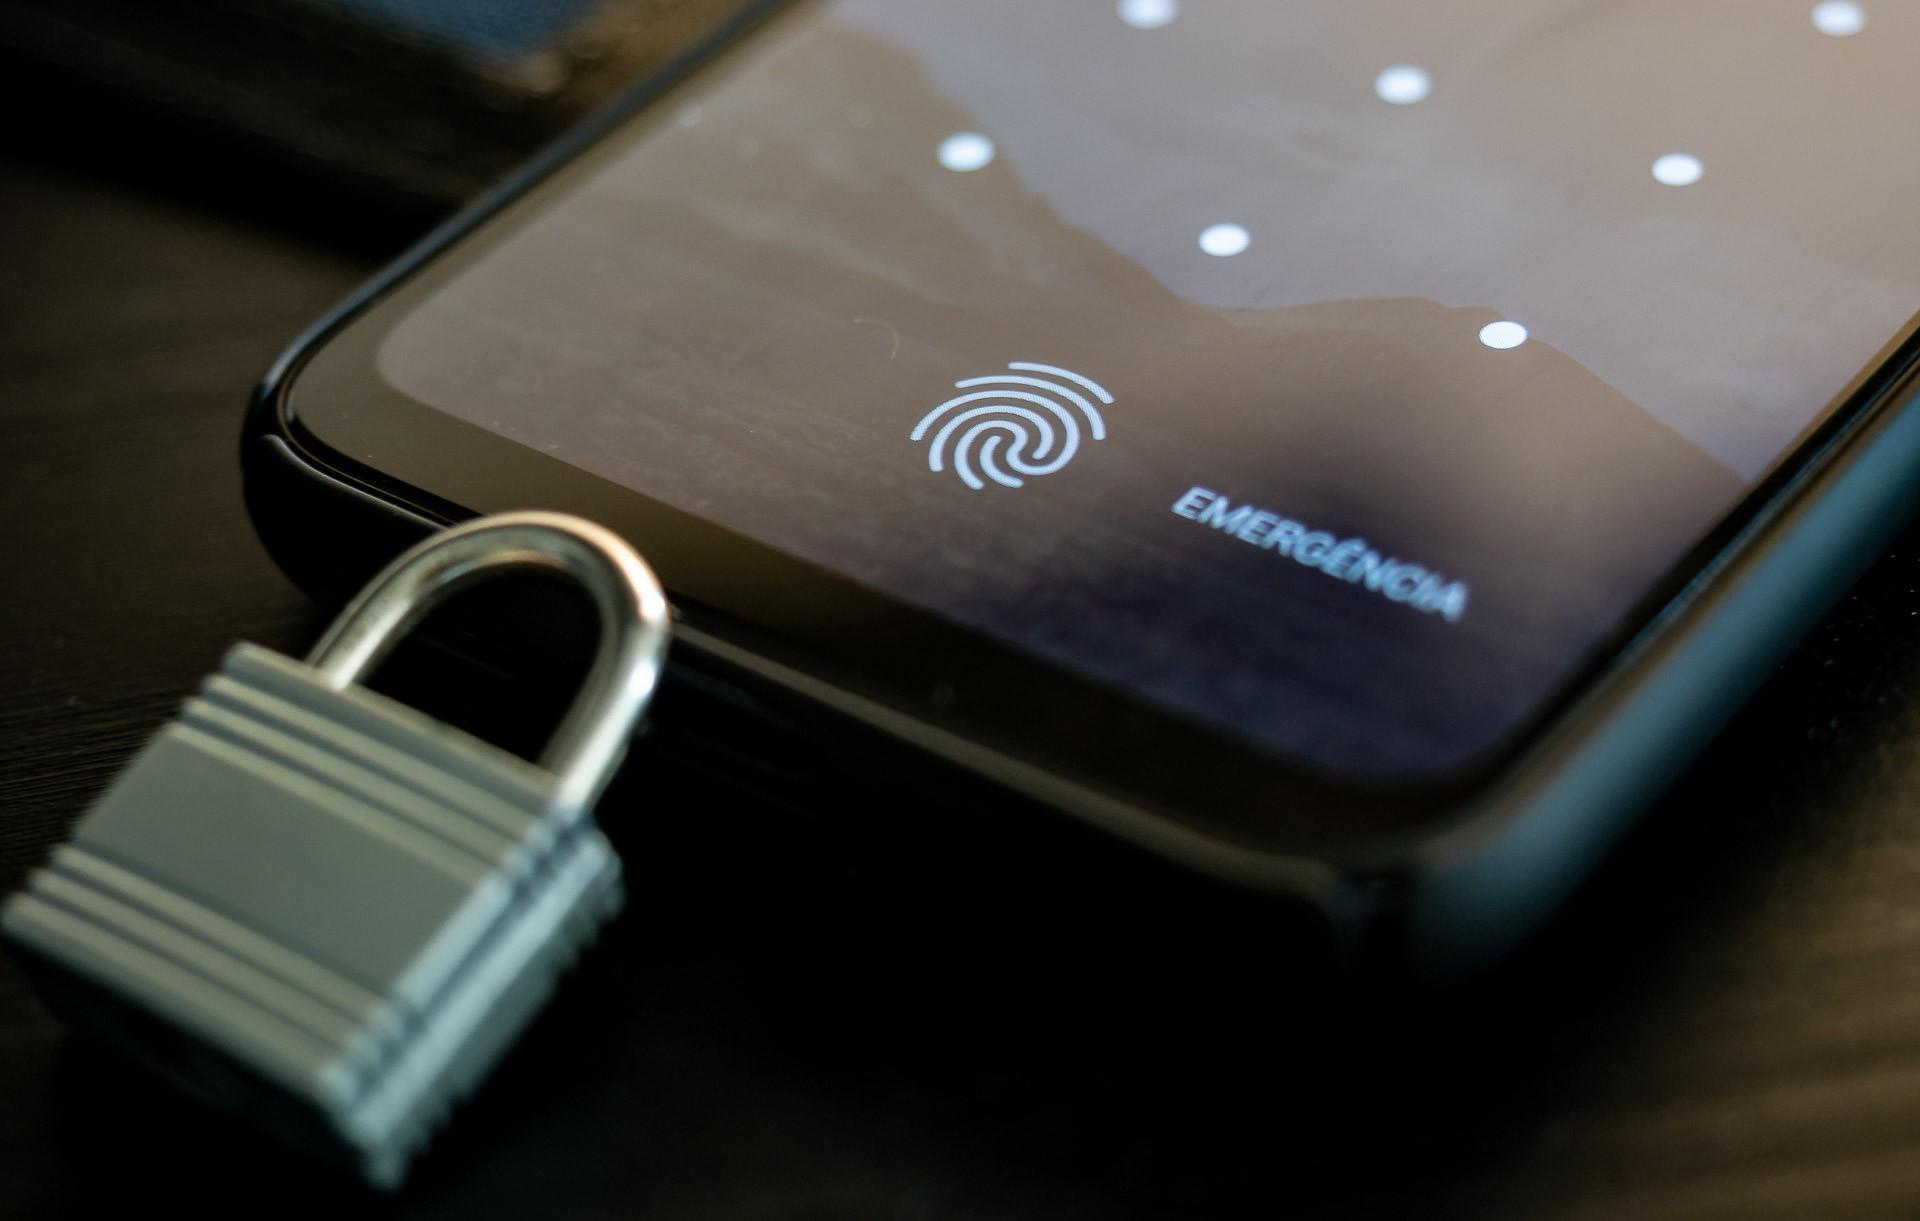 O namorado está espionando o WhatsApp – o que fazer?